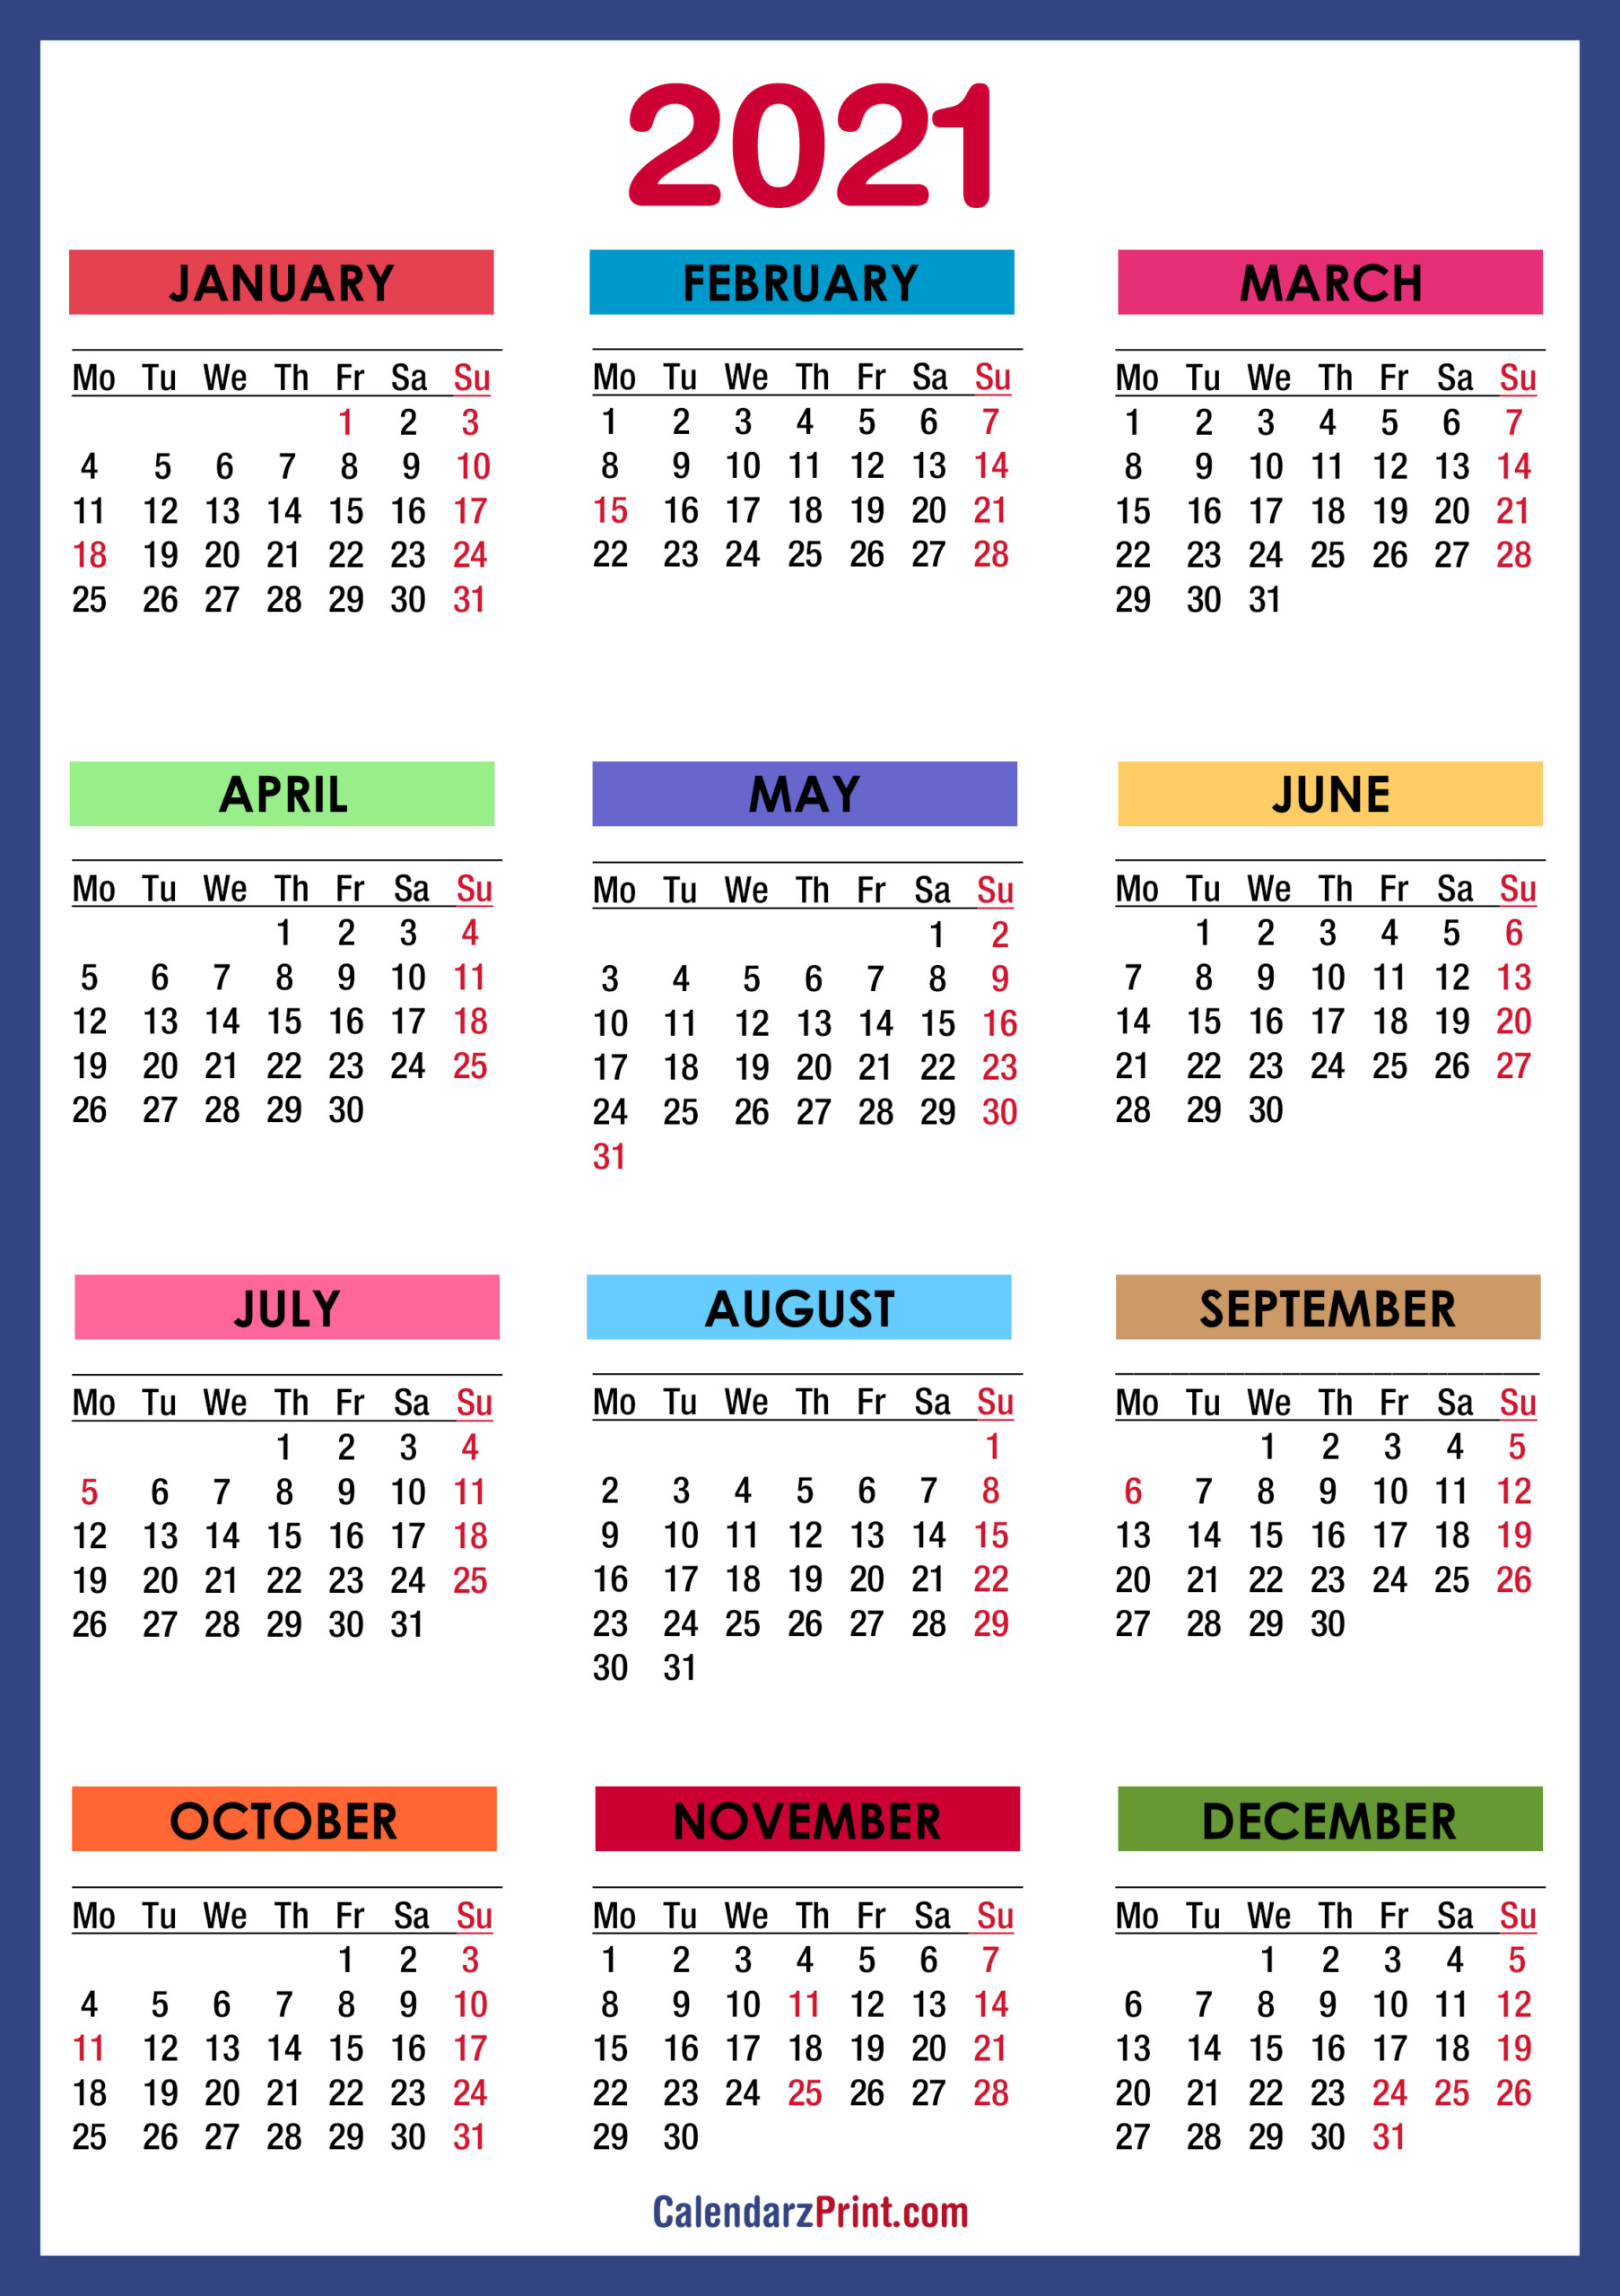 2021 Calendar With Us Holidays Printable Pdf 2021 1